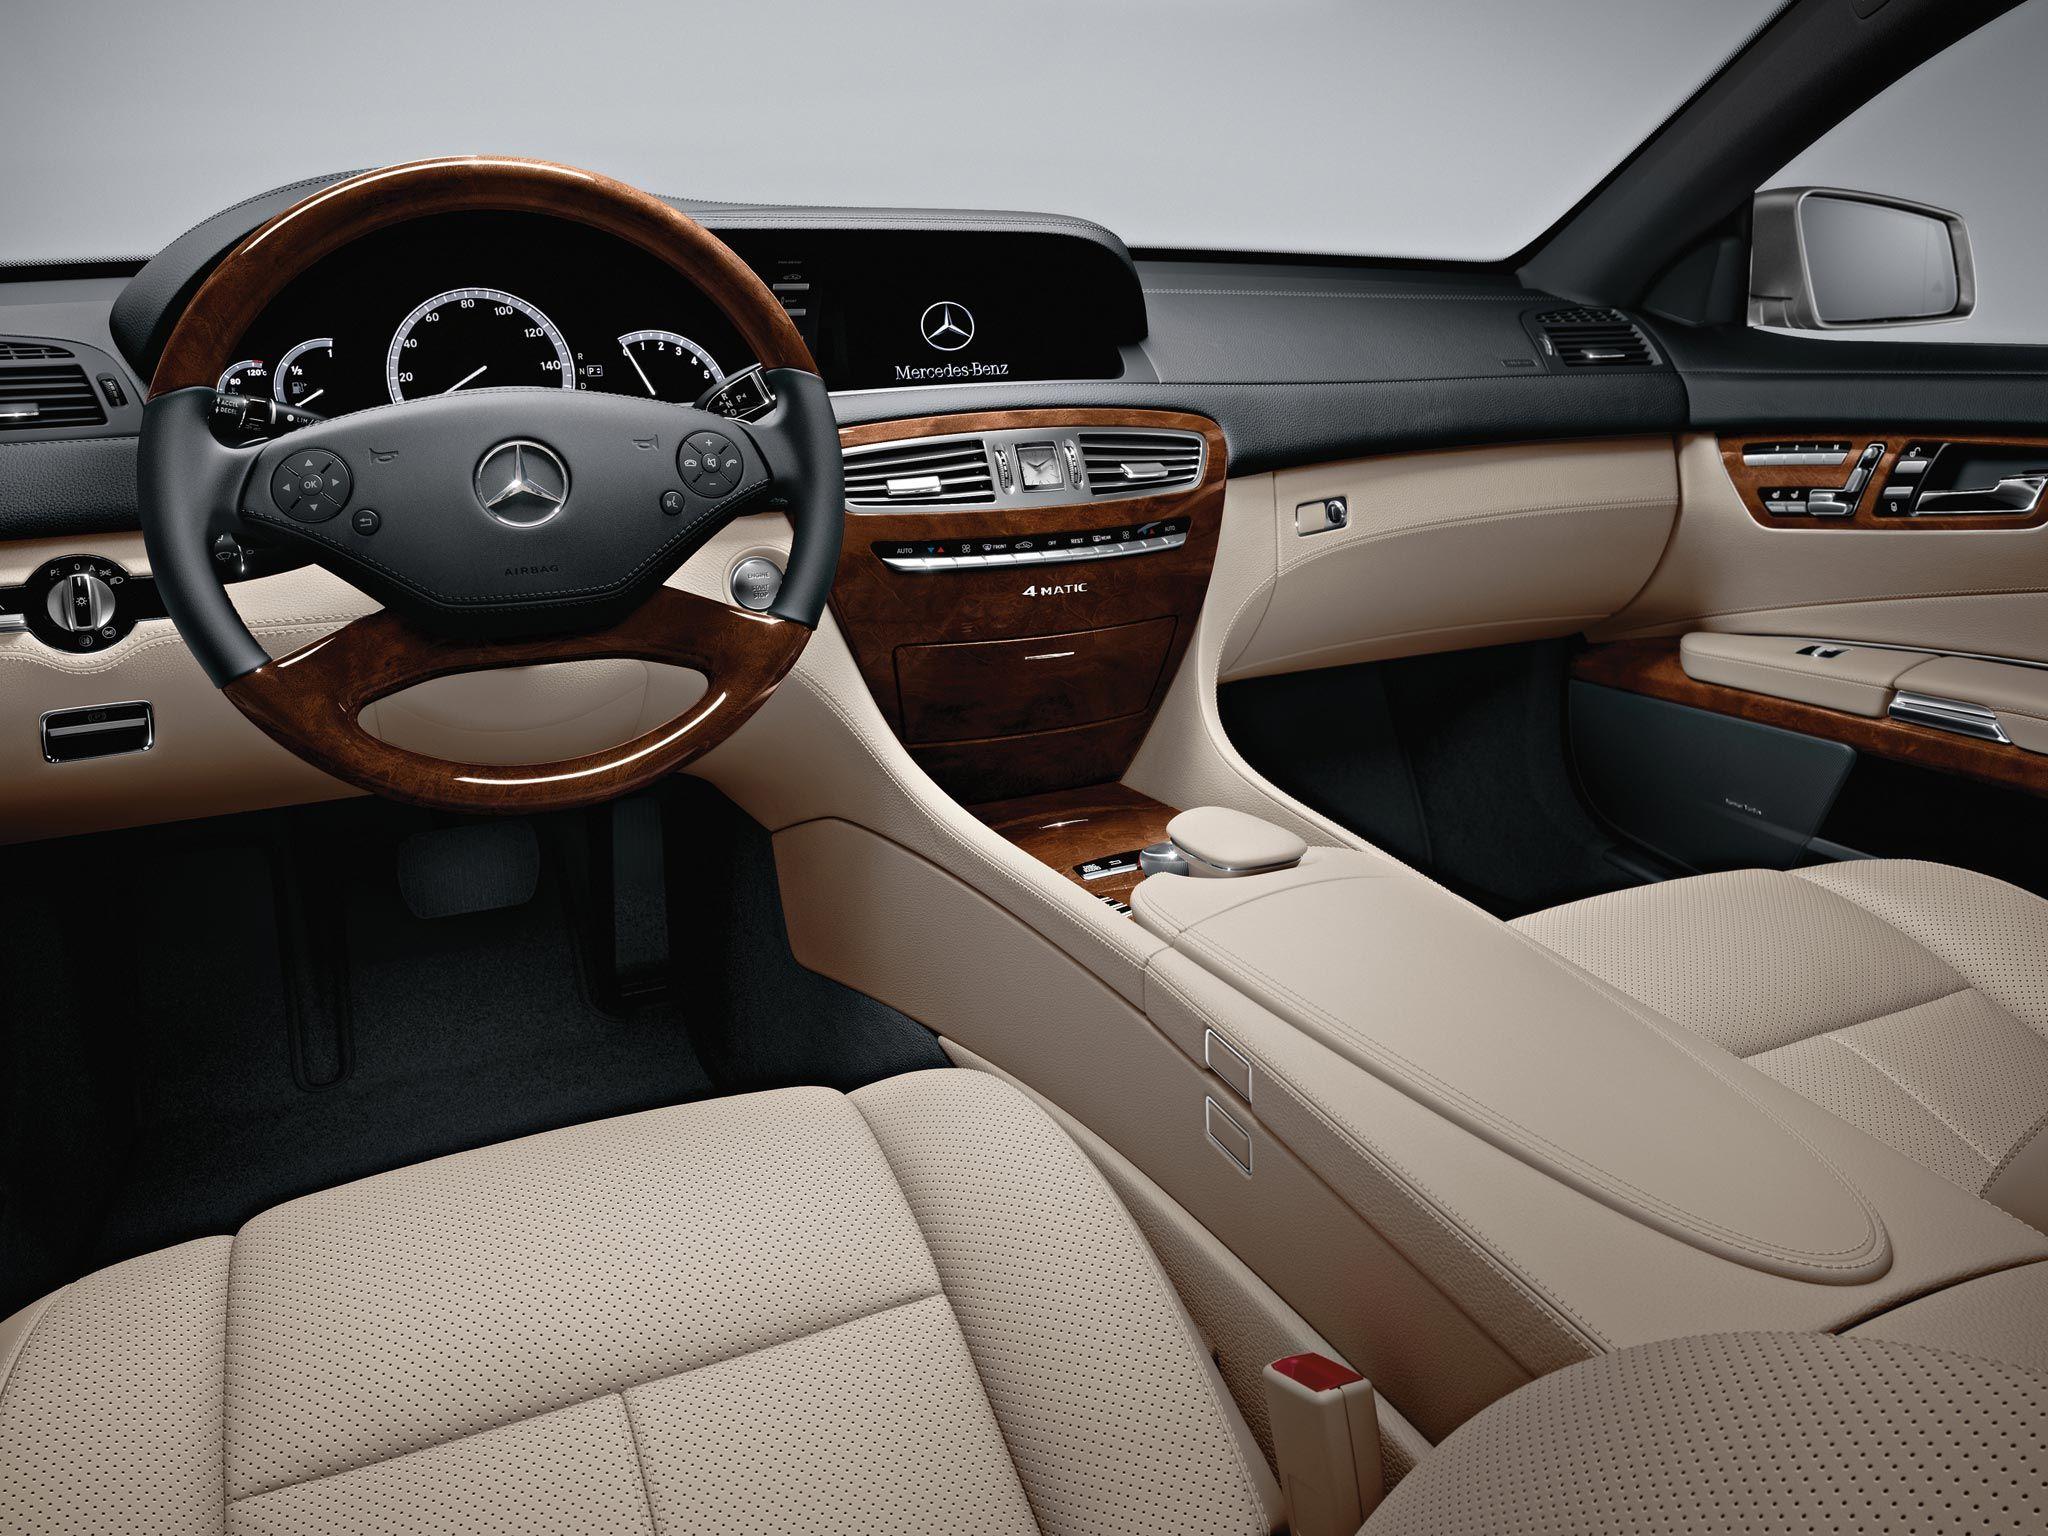 Mercedes benz cl550 4matic with sahara beige black premium leather